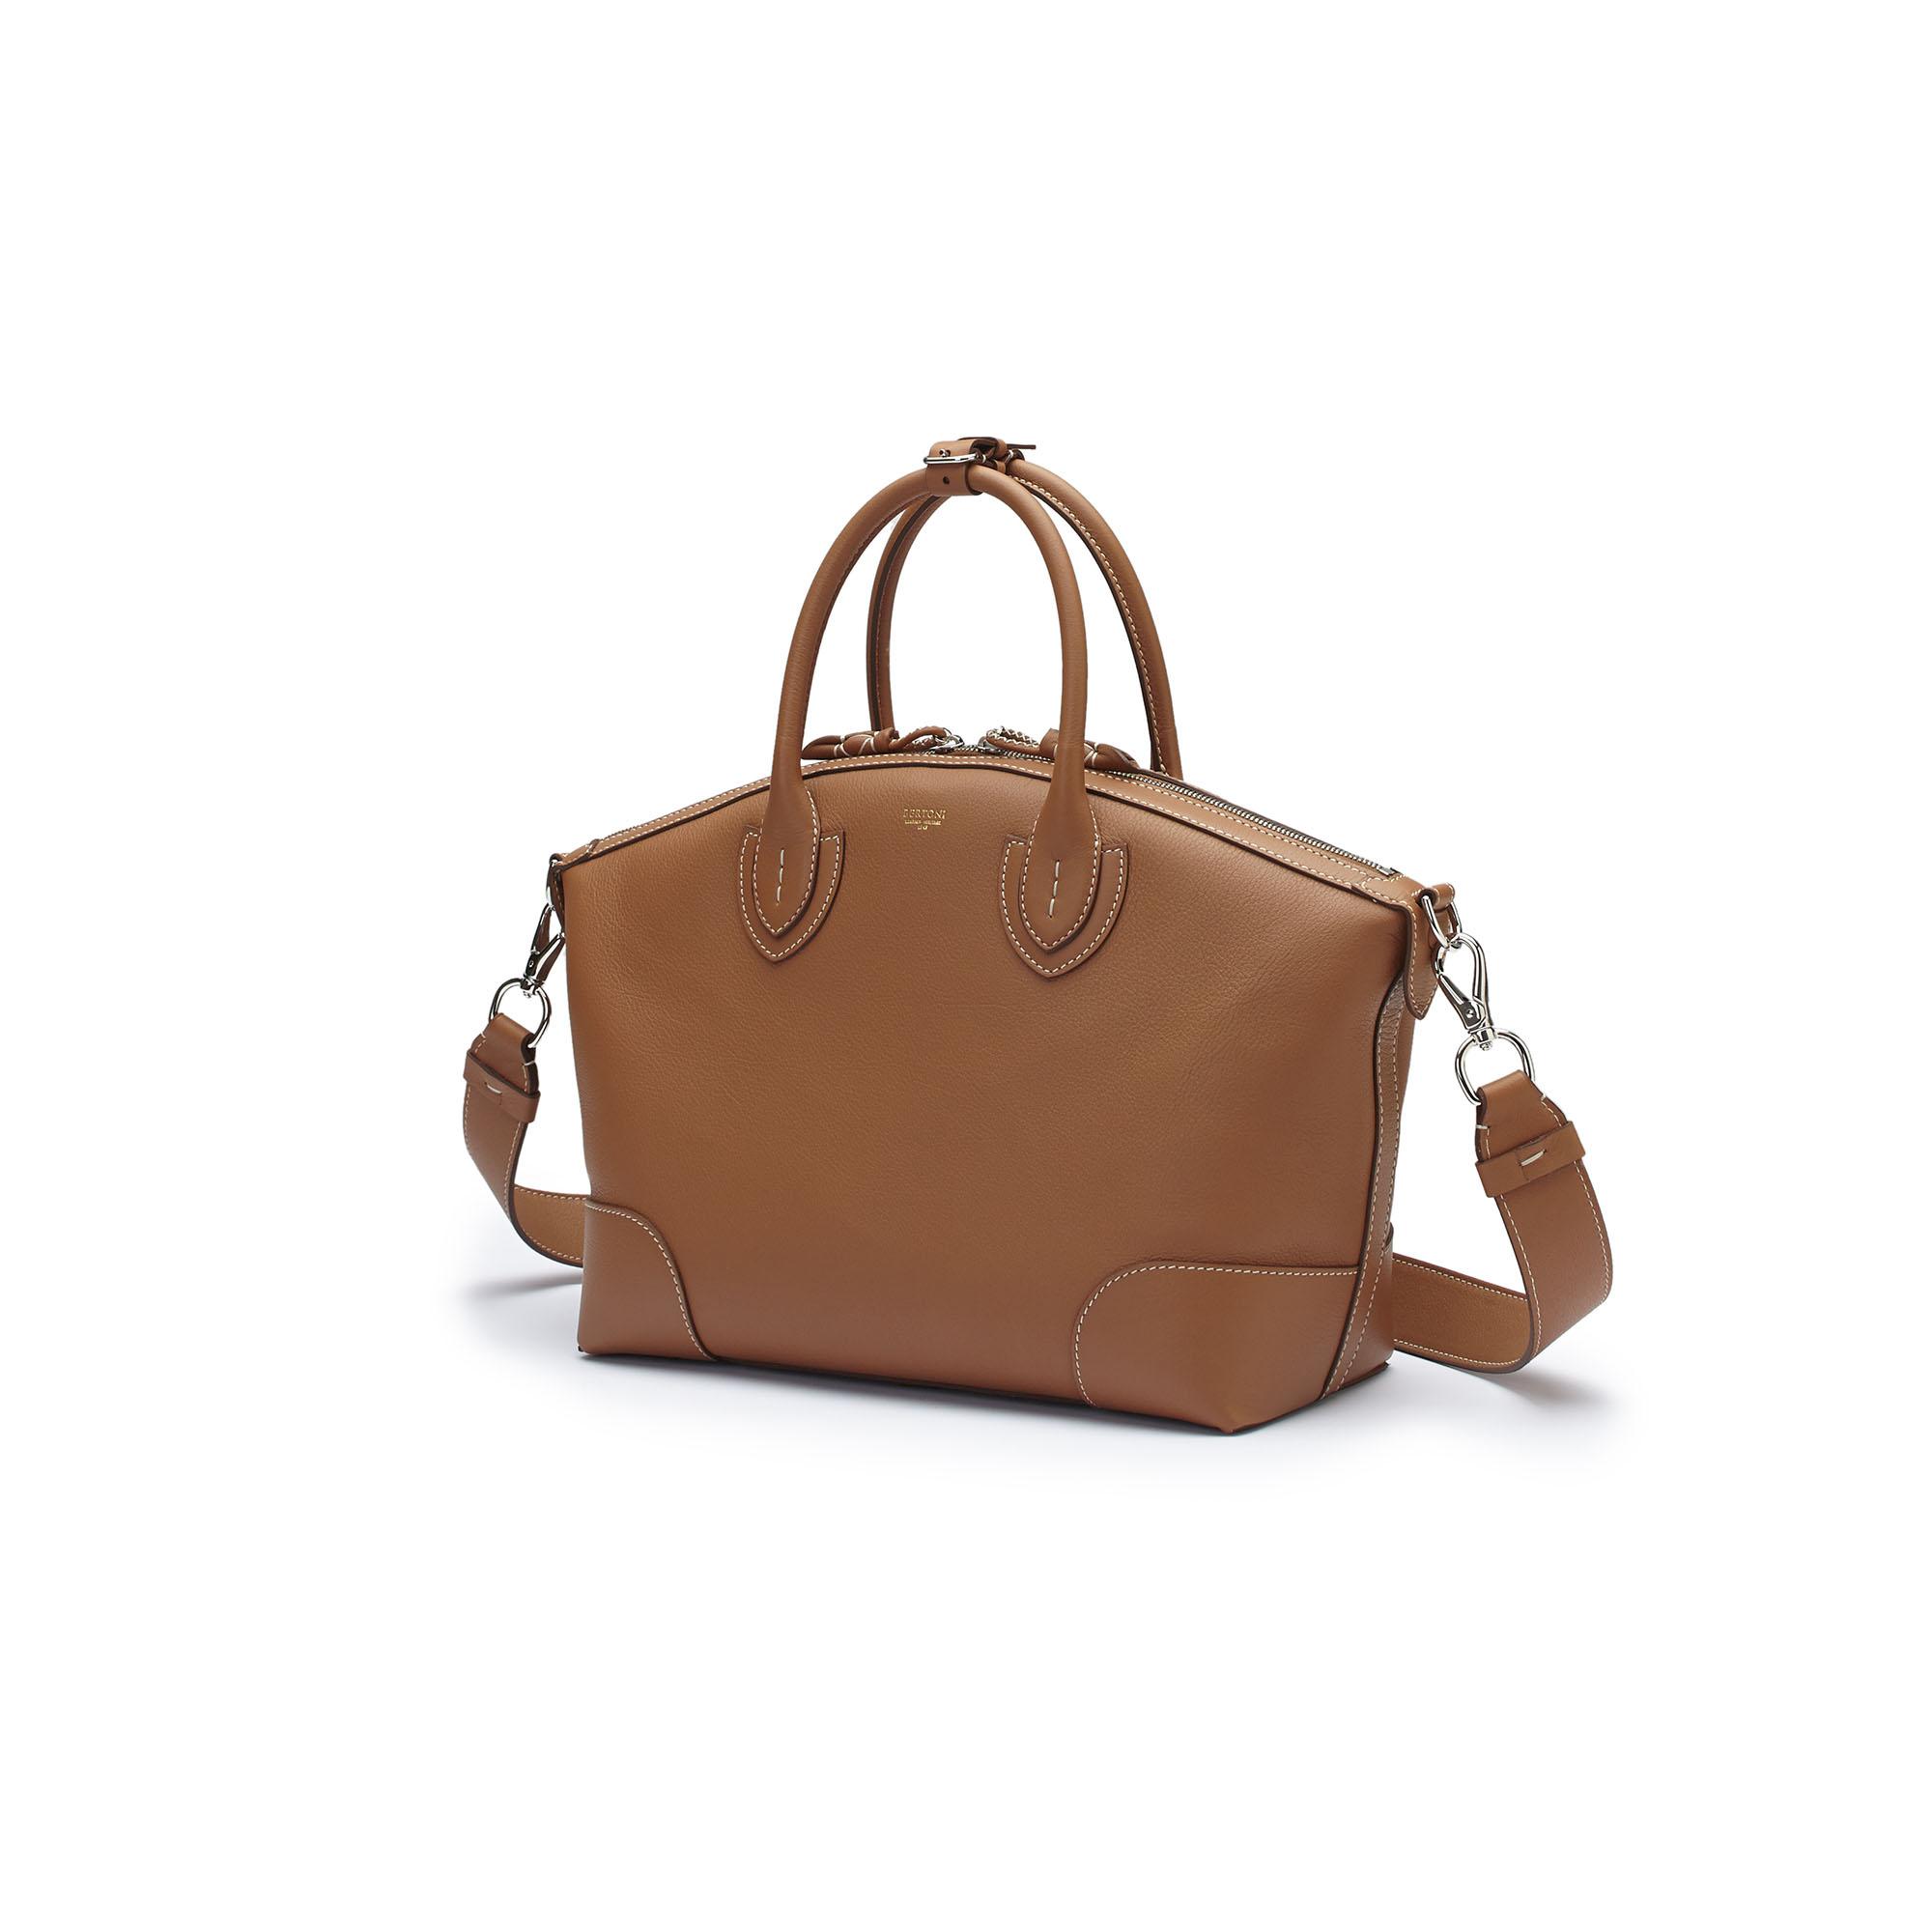 The cognac soft calf Anija bag by Bertoni 1949 04